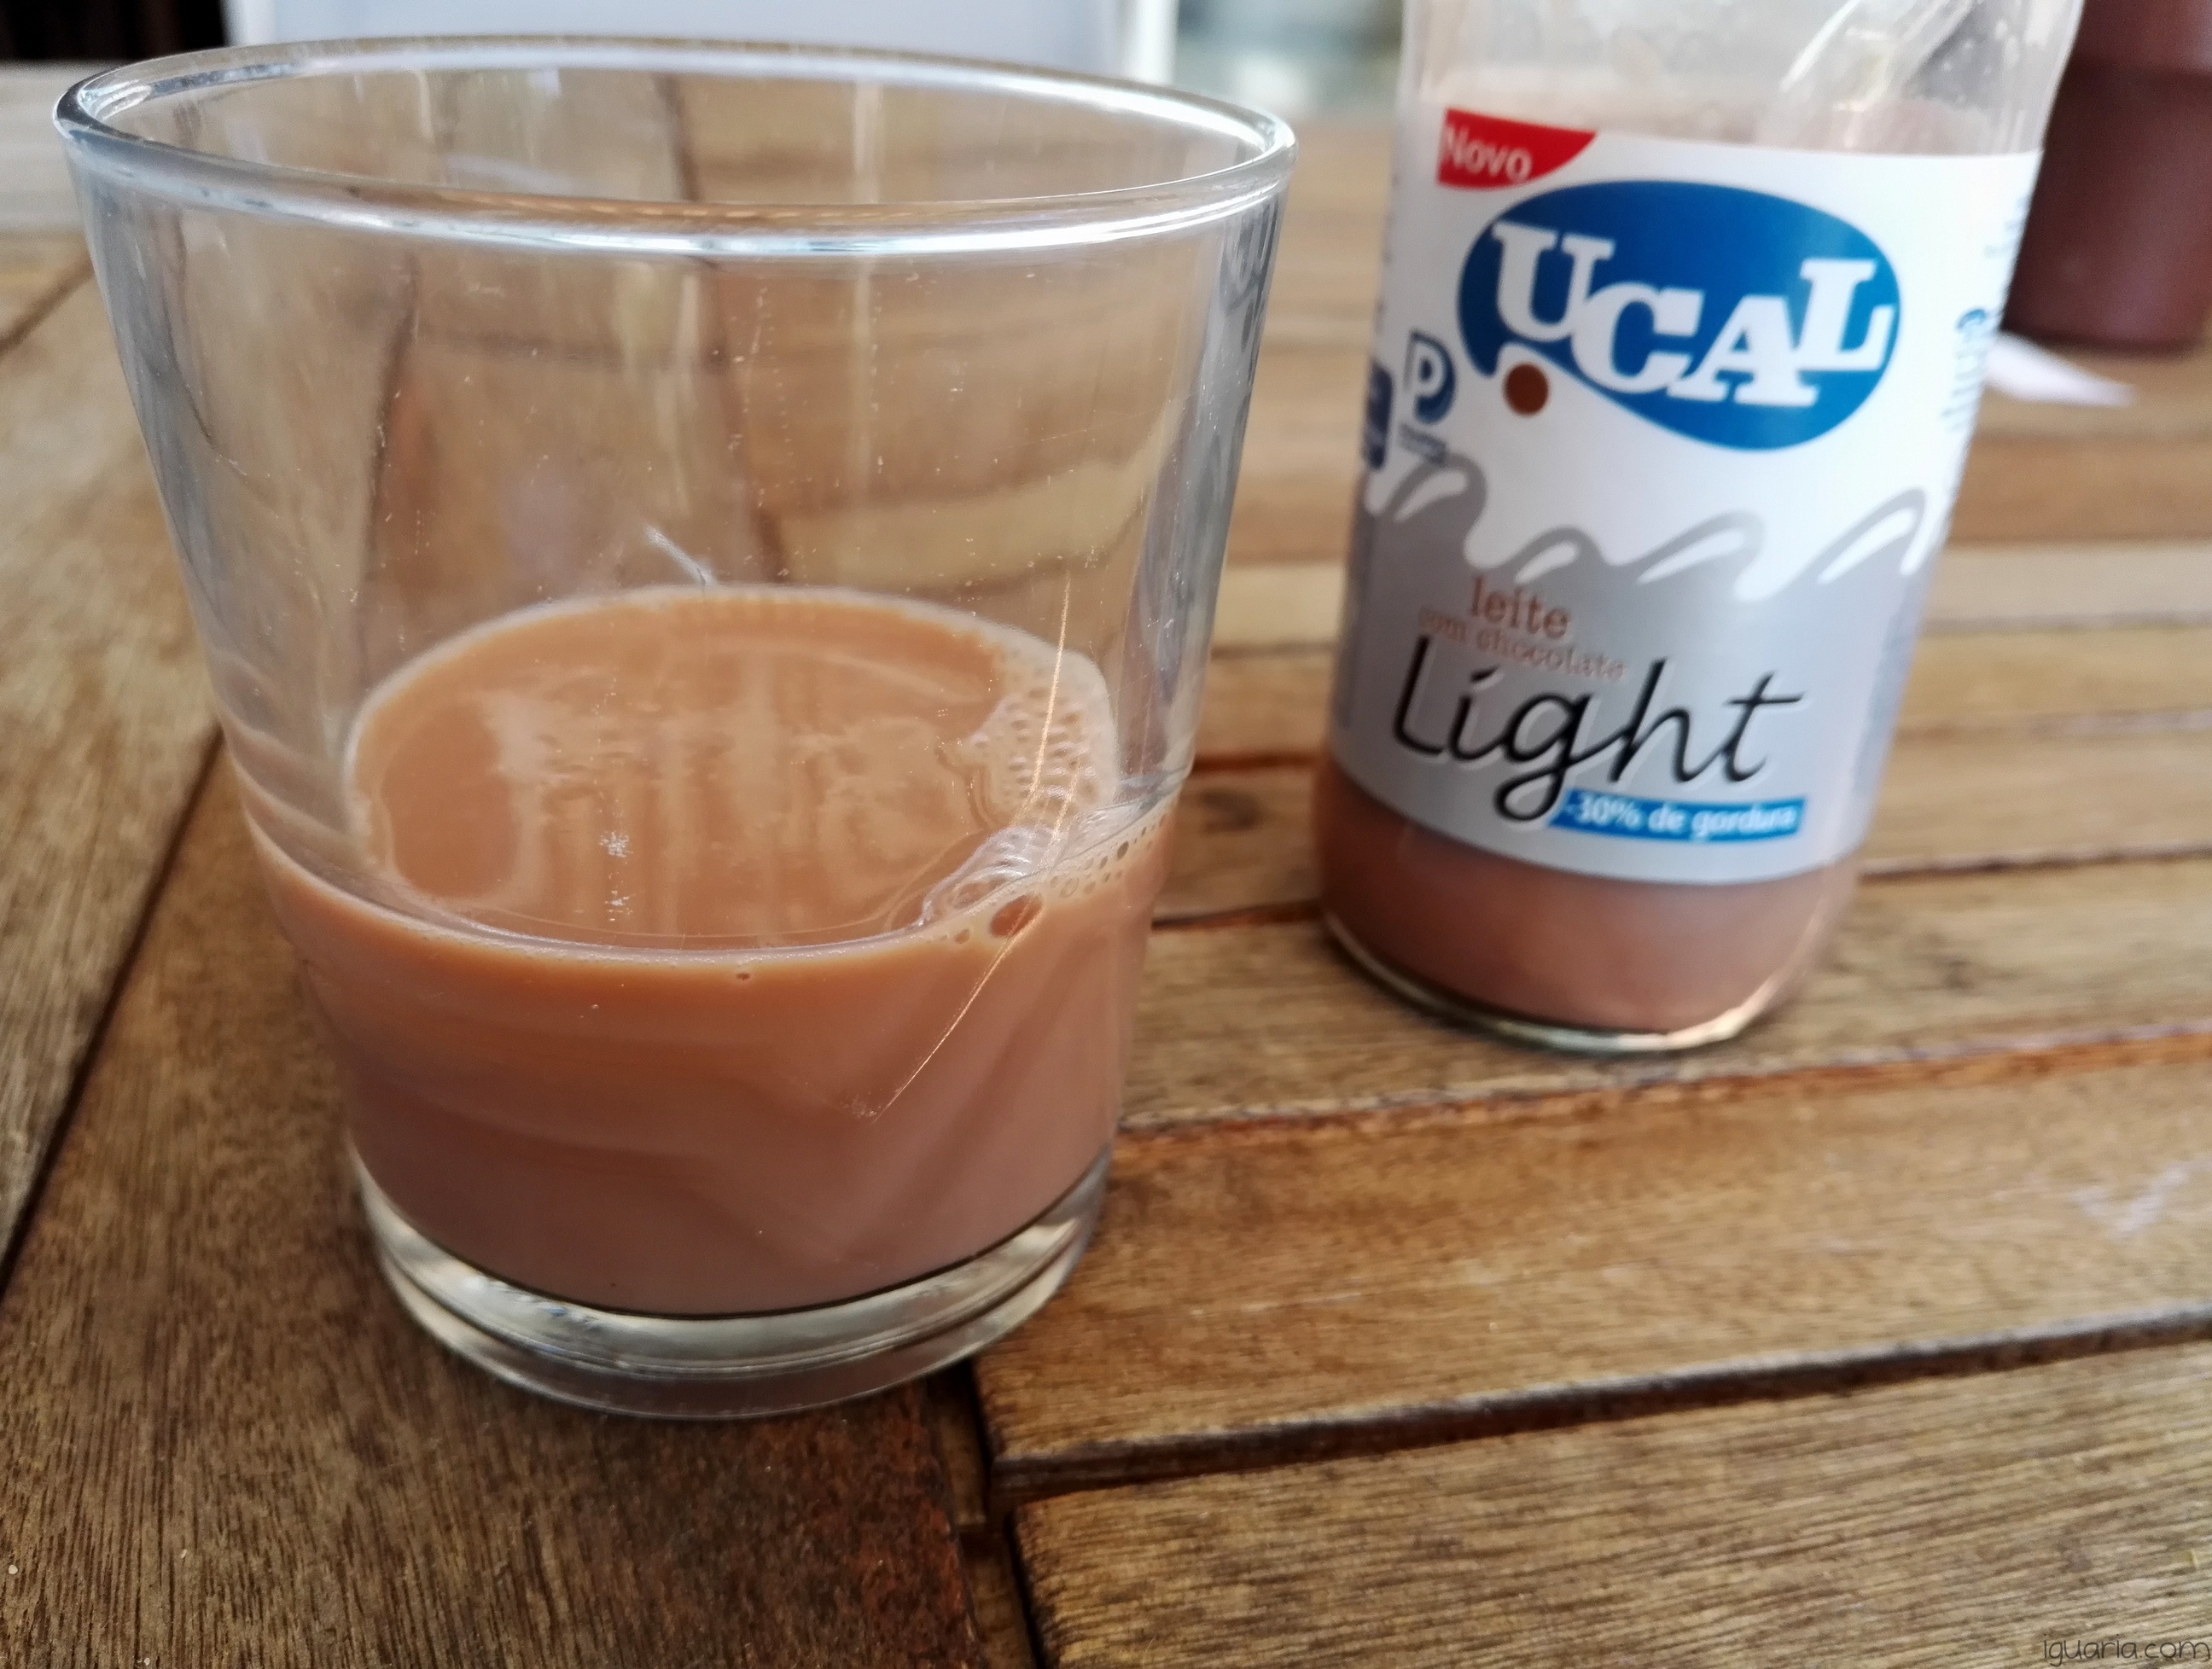 Iguaria_UCAL-Light-Leite-Chocolate